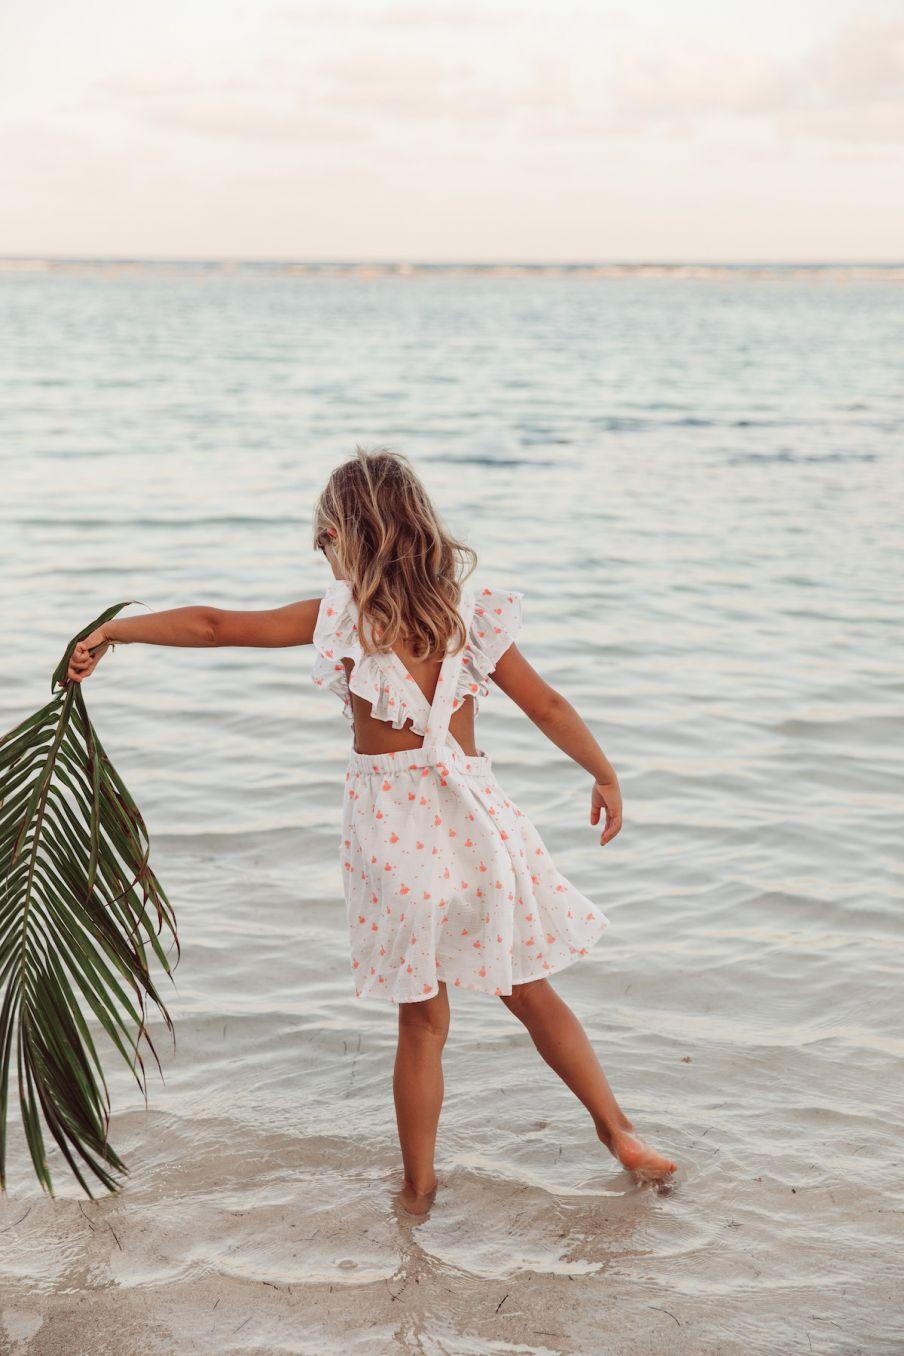 boheme chic vintage robe bébé fille varadero hawai fabric